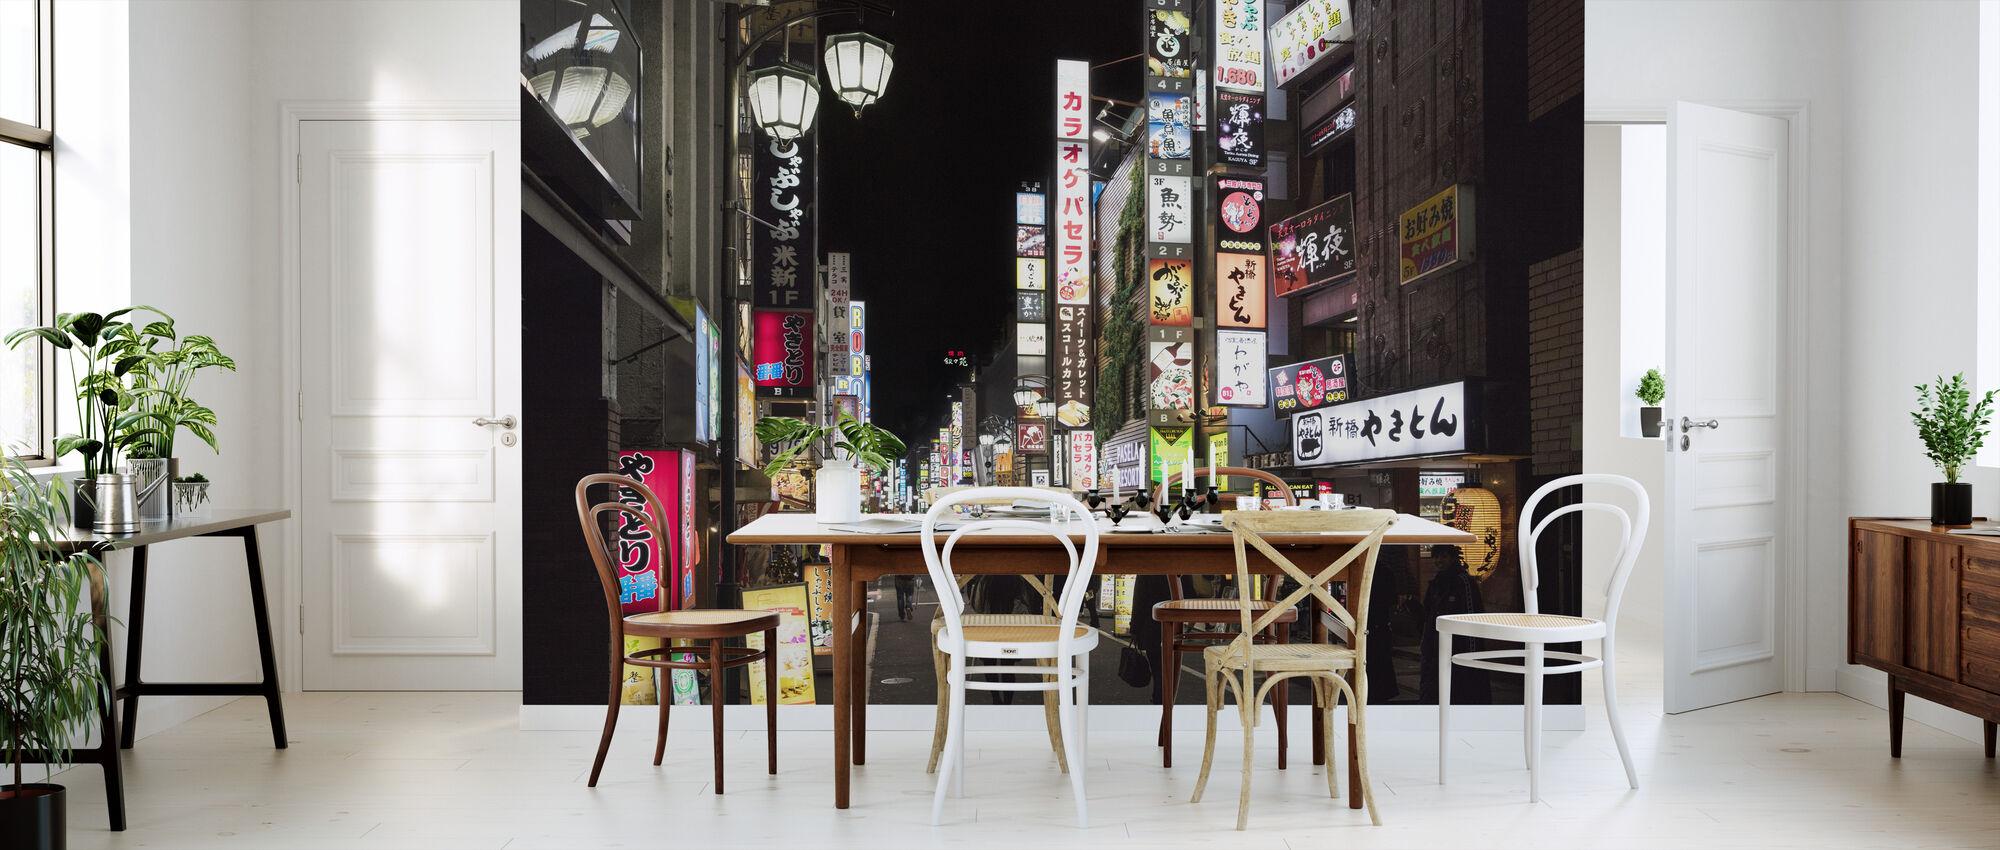 Shibuja at Night Tokyo - Wallpaper - Kitchen